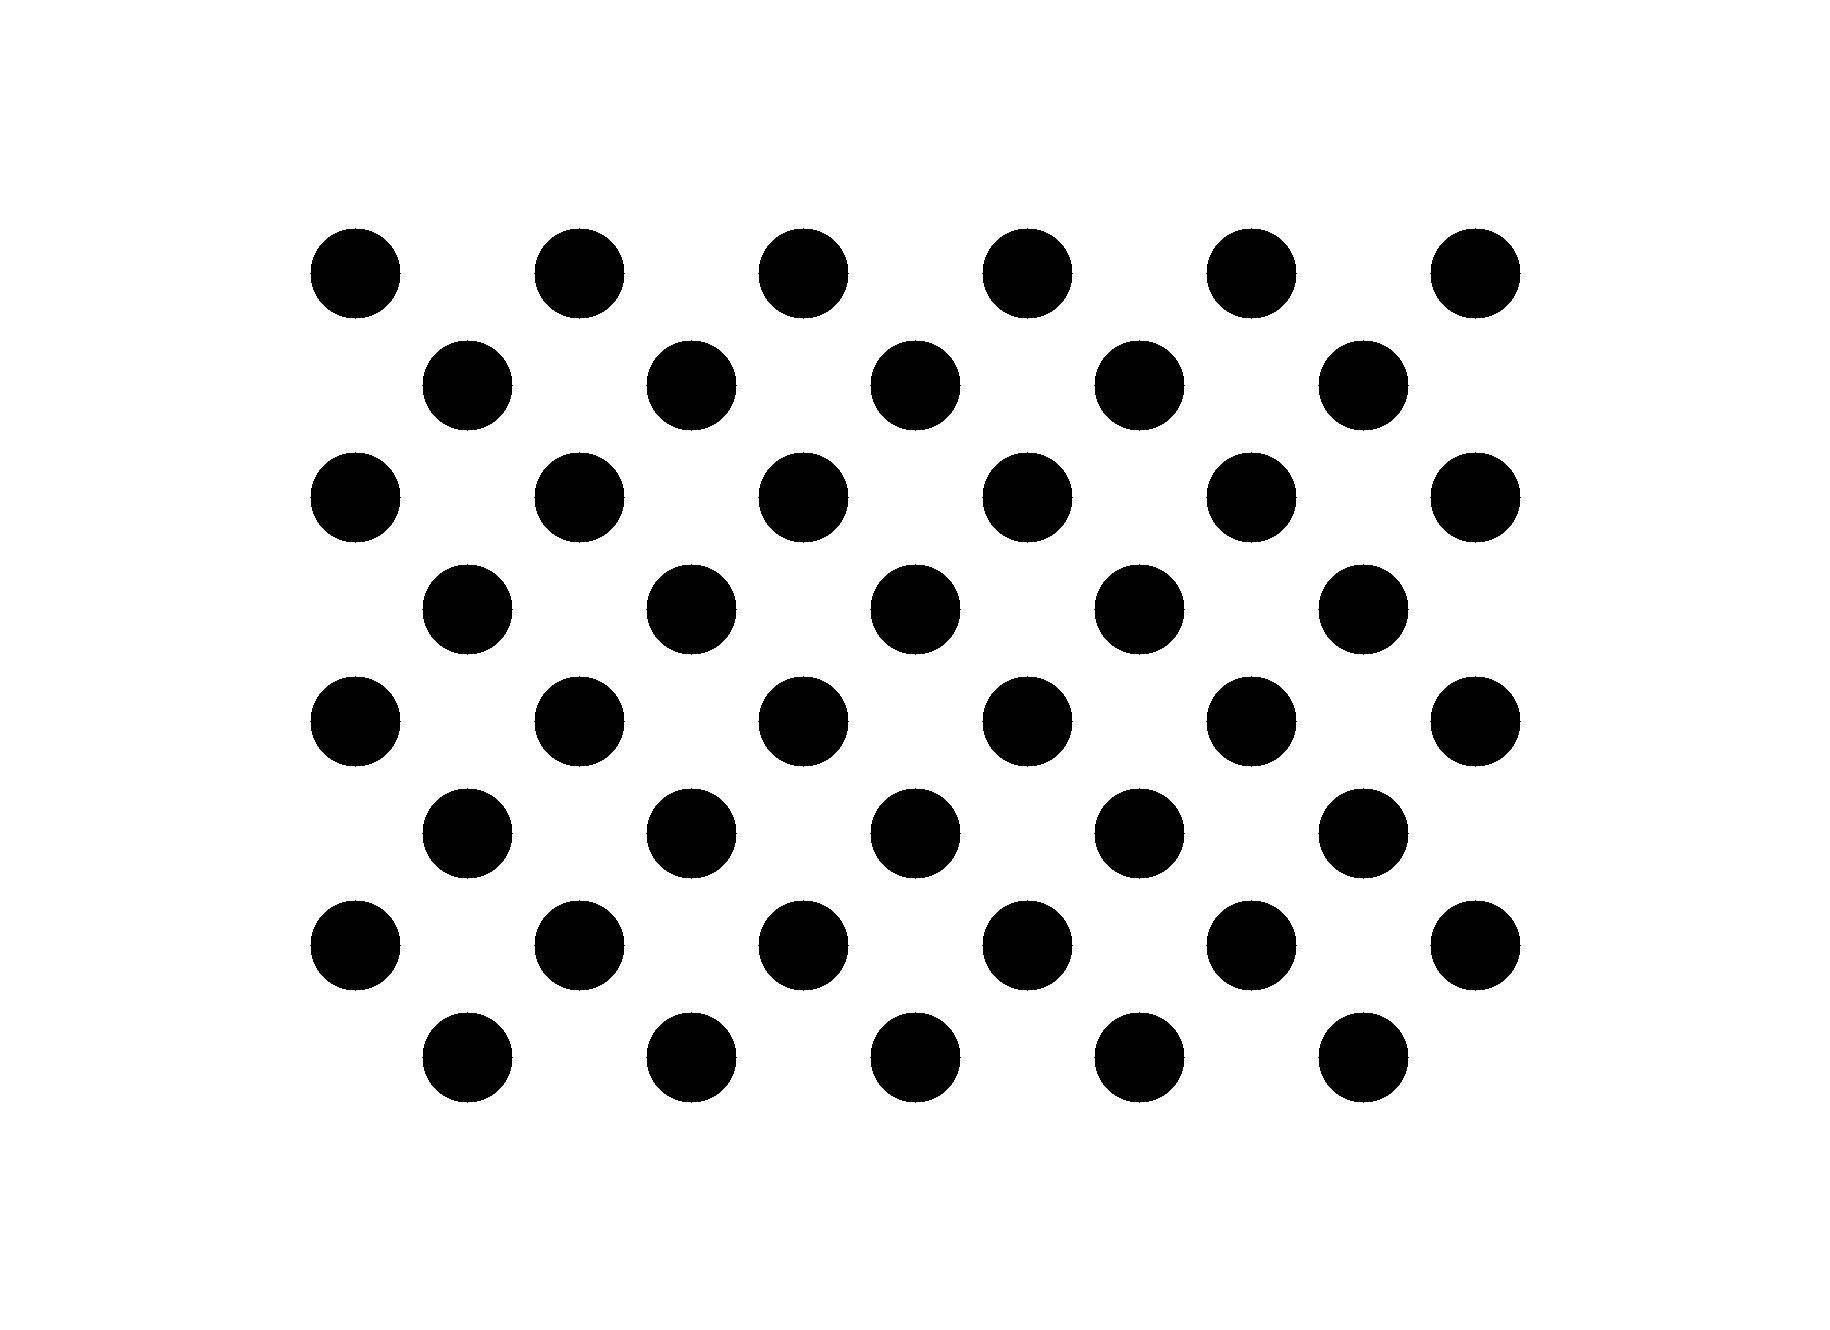 asymmetric_circle_grid